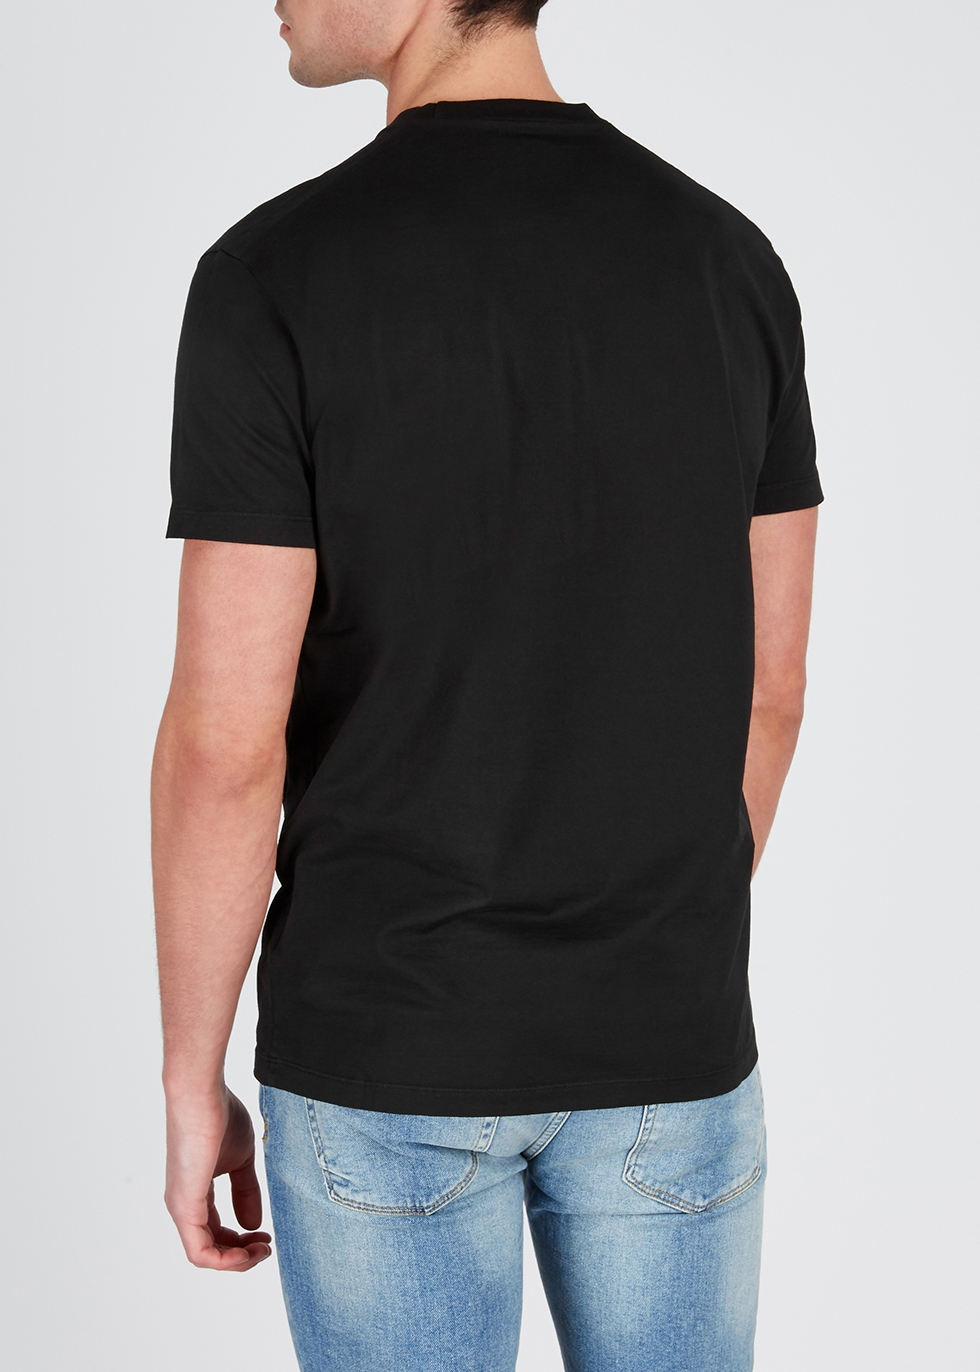 Black printed cotton T-shirt - Dsquared2